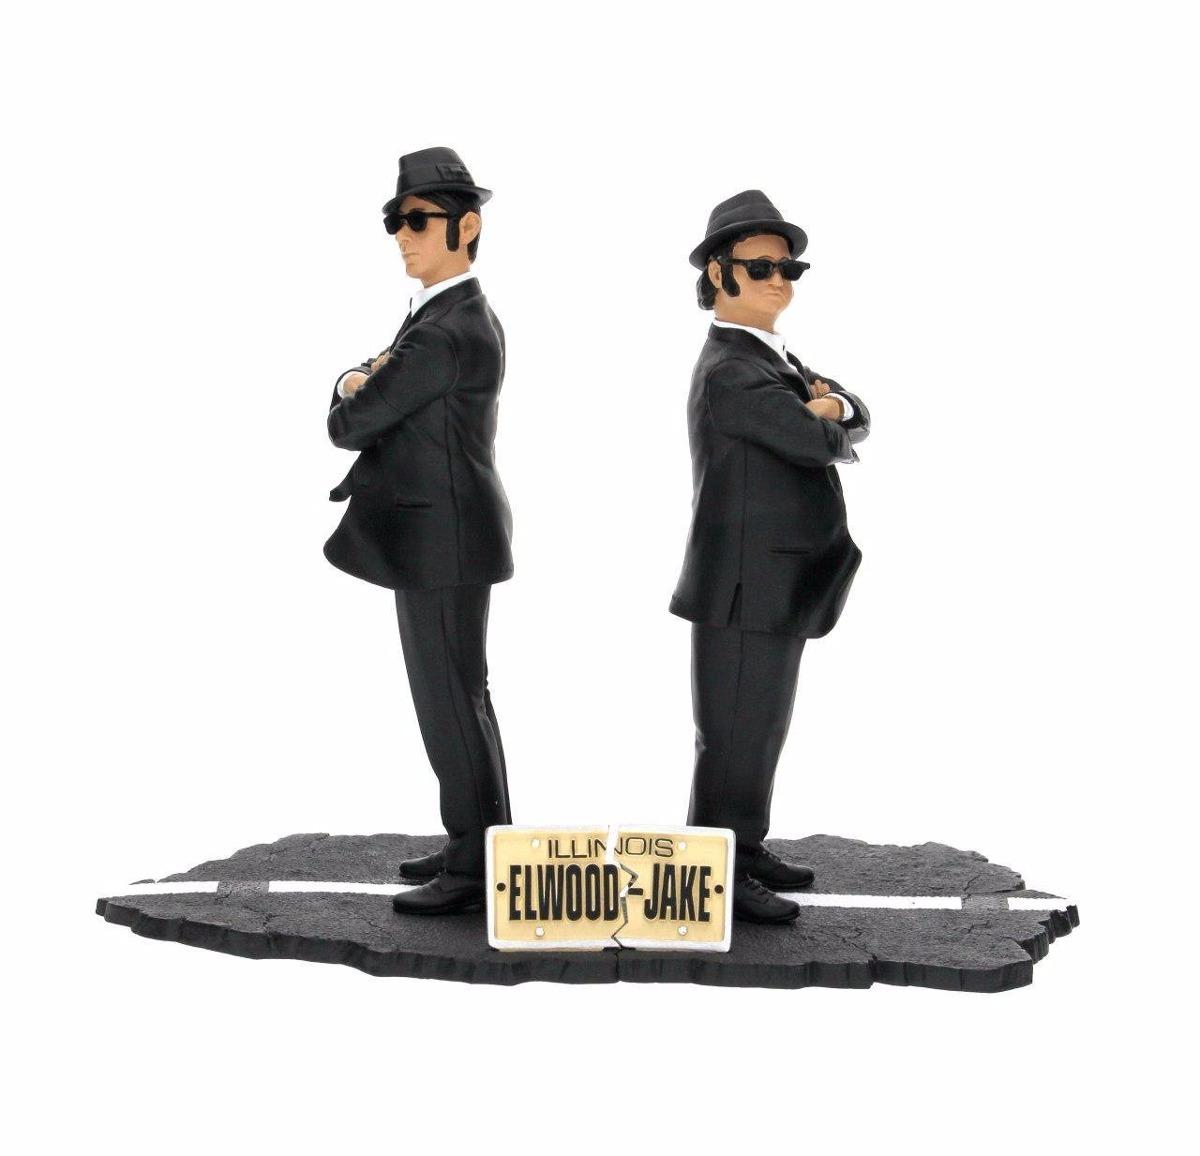 Jake & Elwood Blues - The Blues Brothers ( Os Irmãos Cara de Pau ) - SD Toys